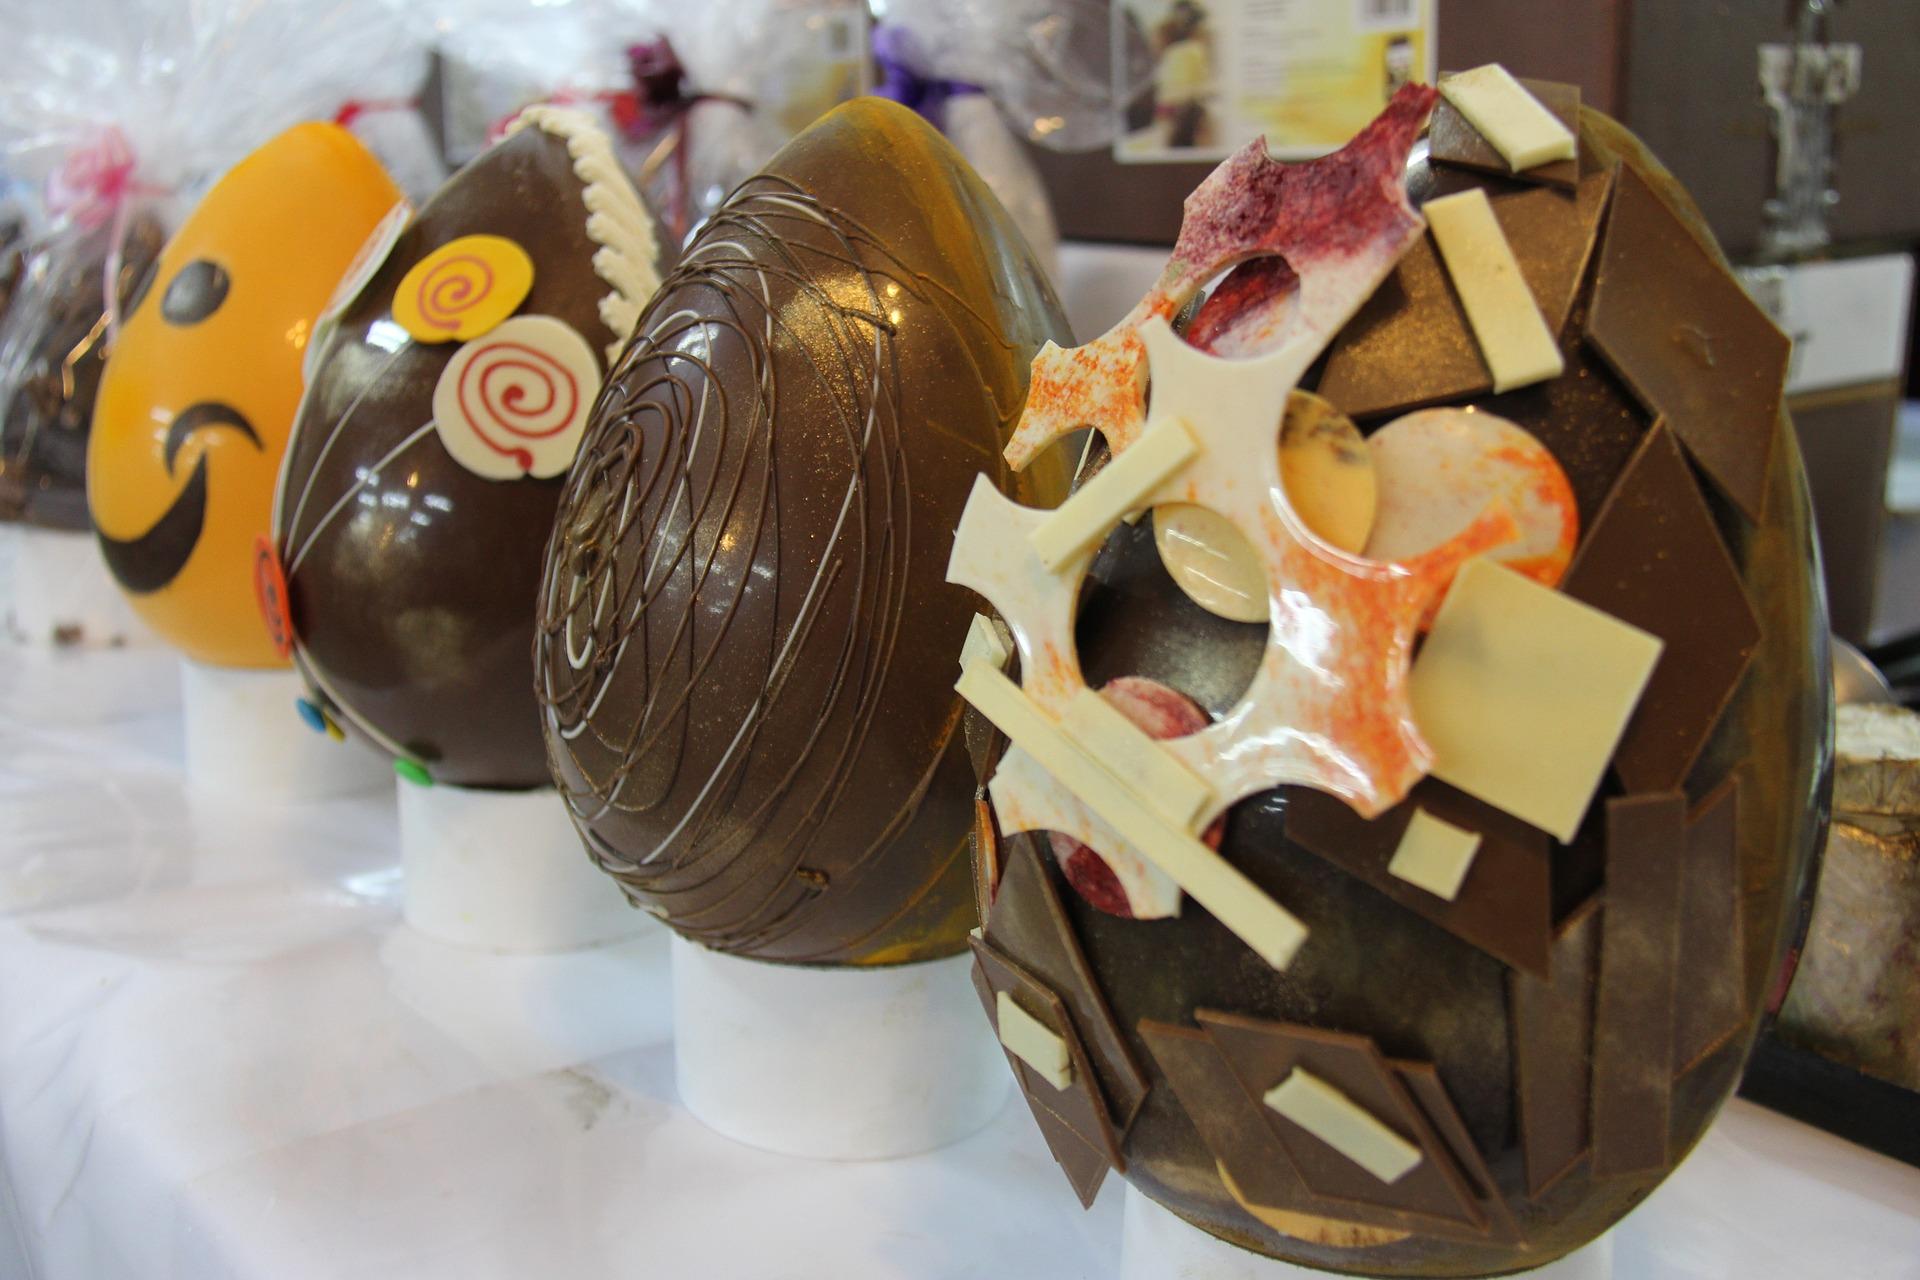 chocolate-factory-678746_1920.jpg